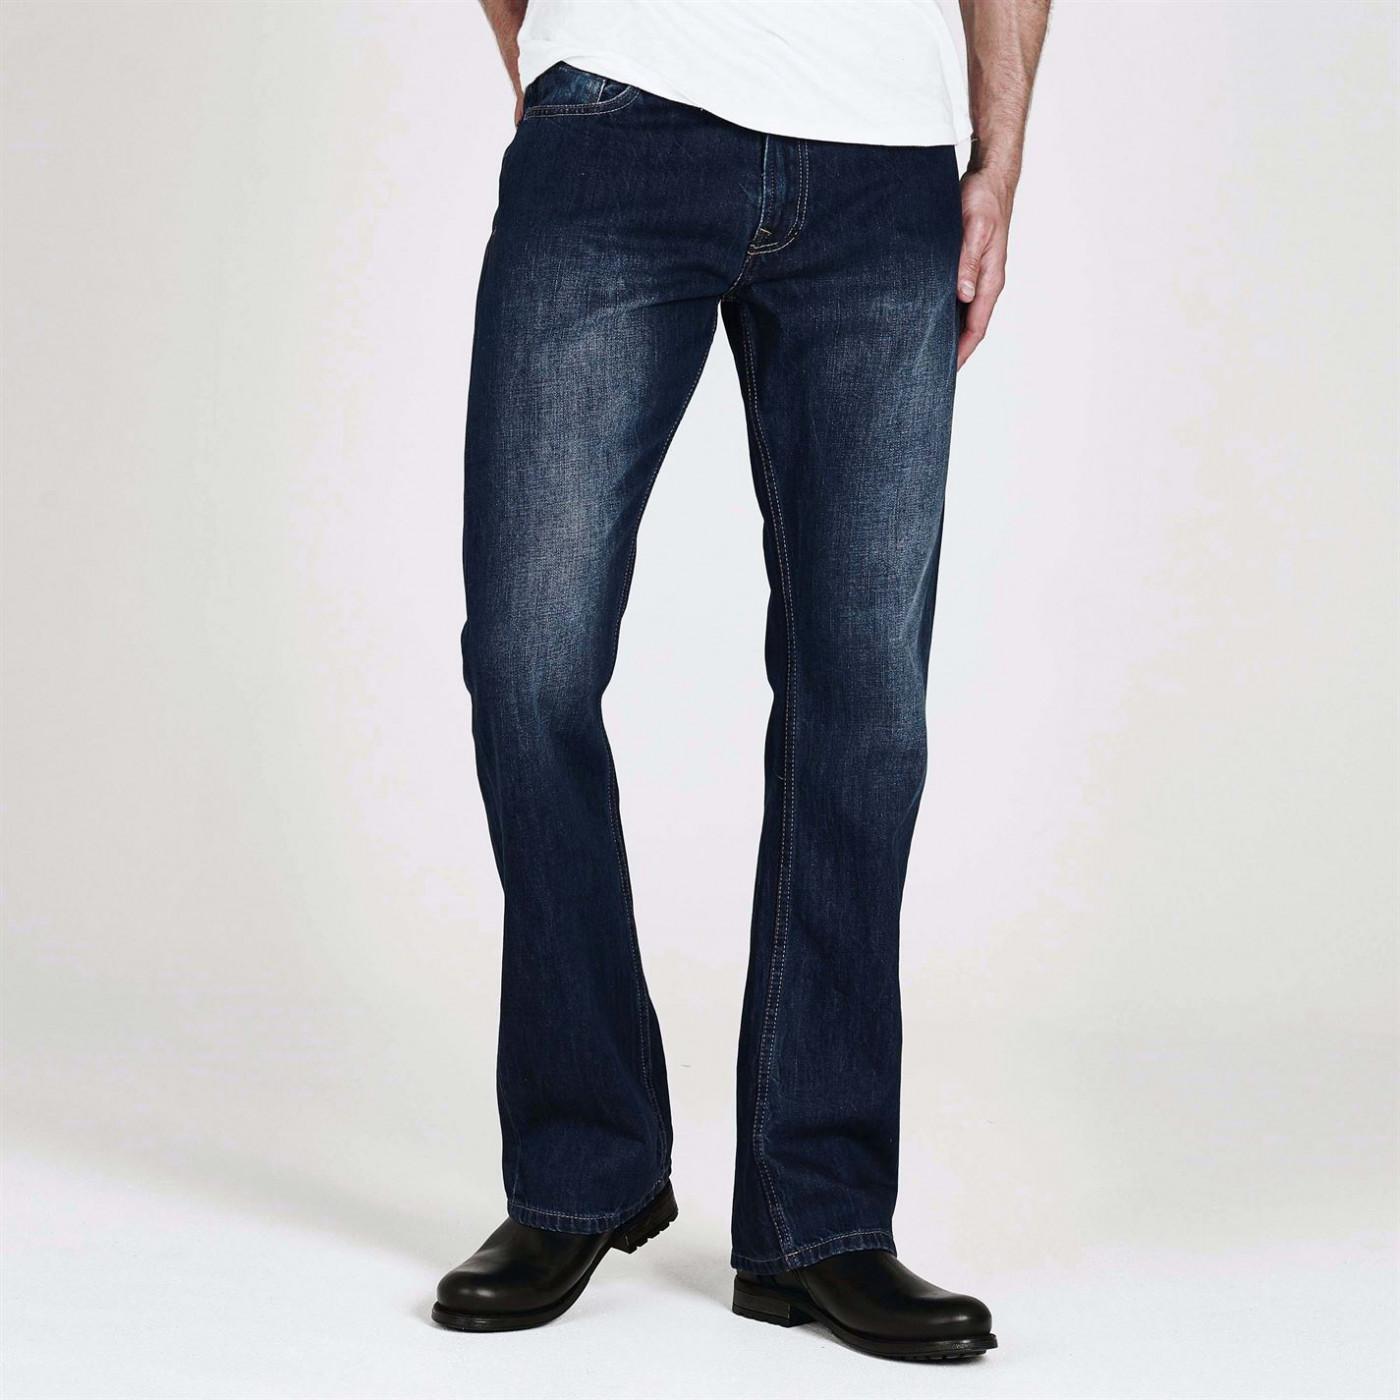 Men's jeans Firetrap Tokyo